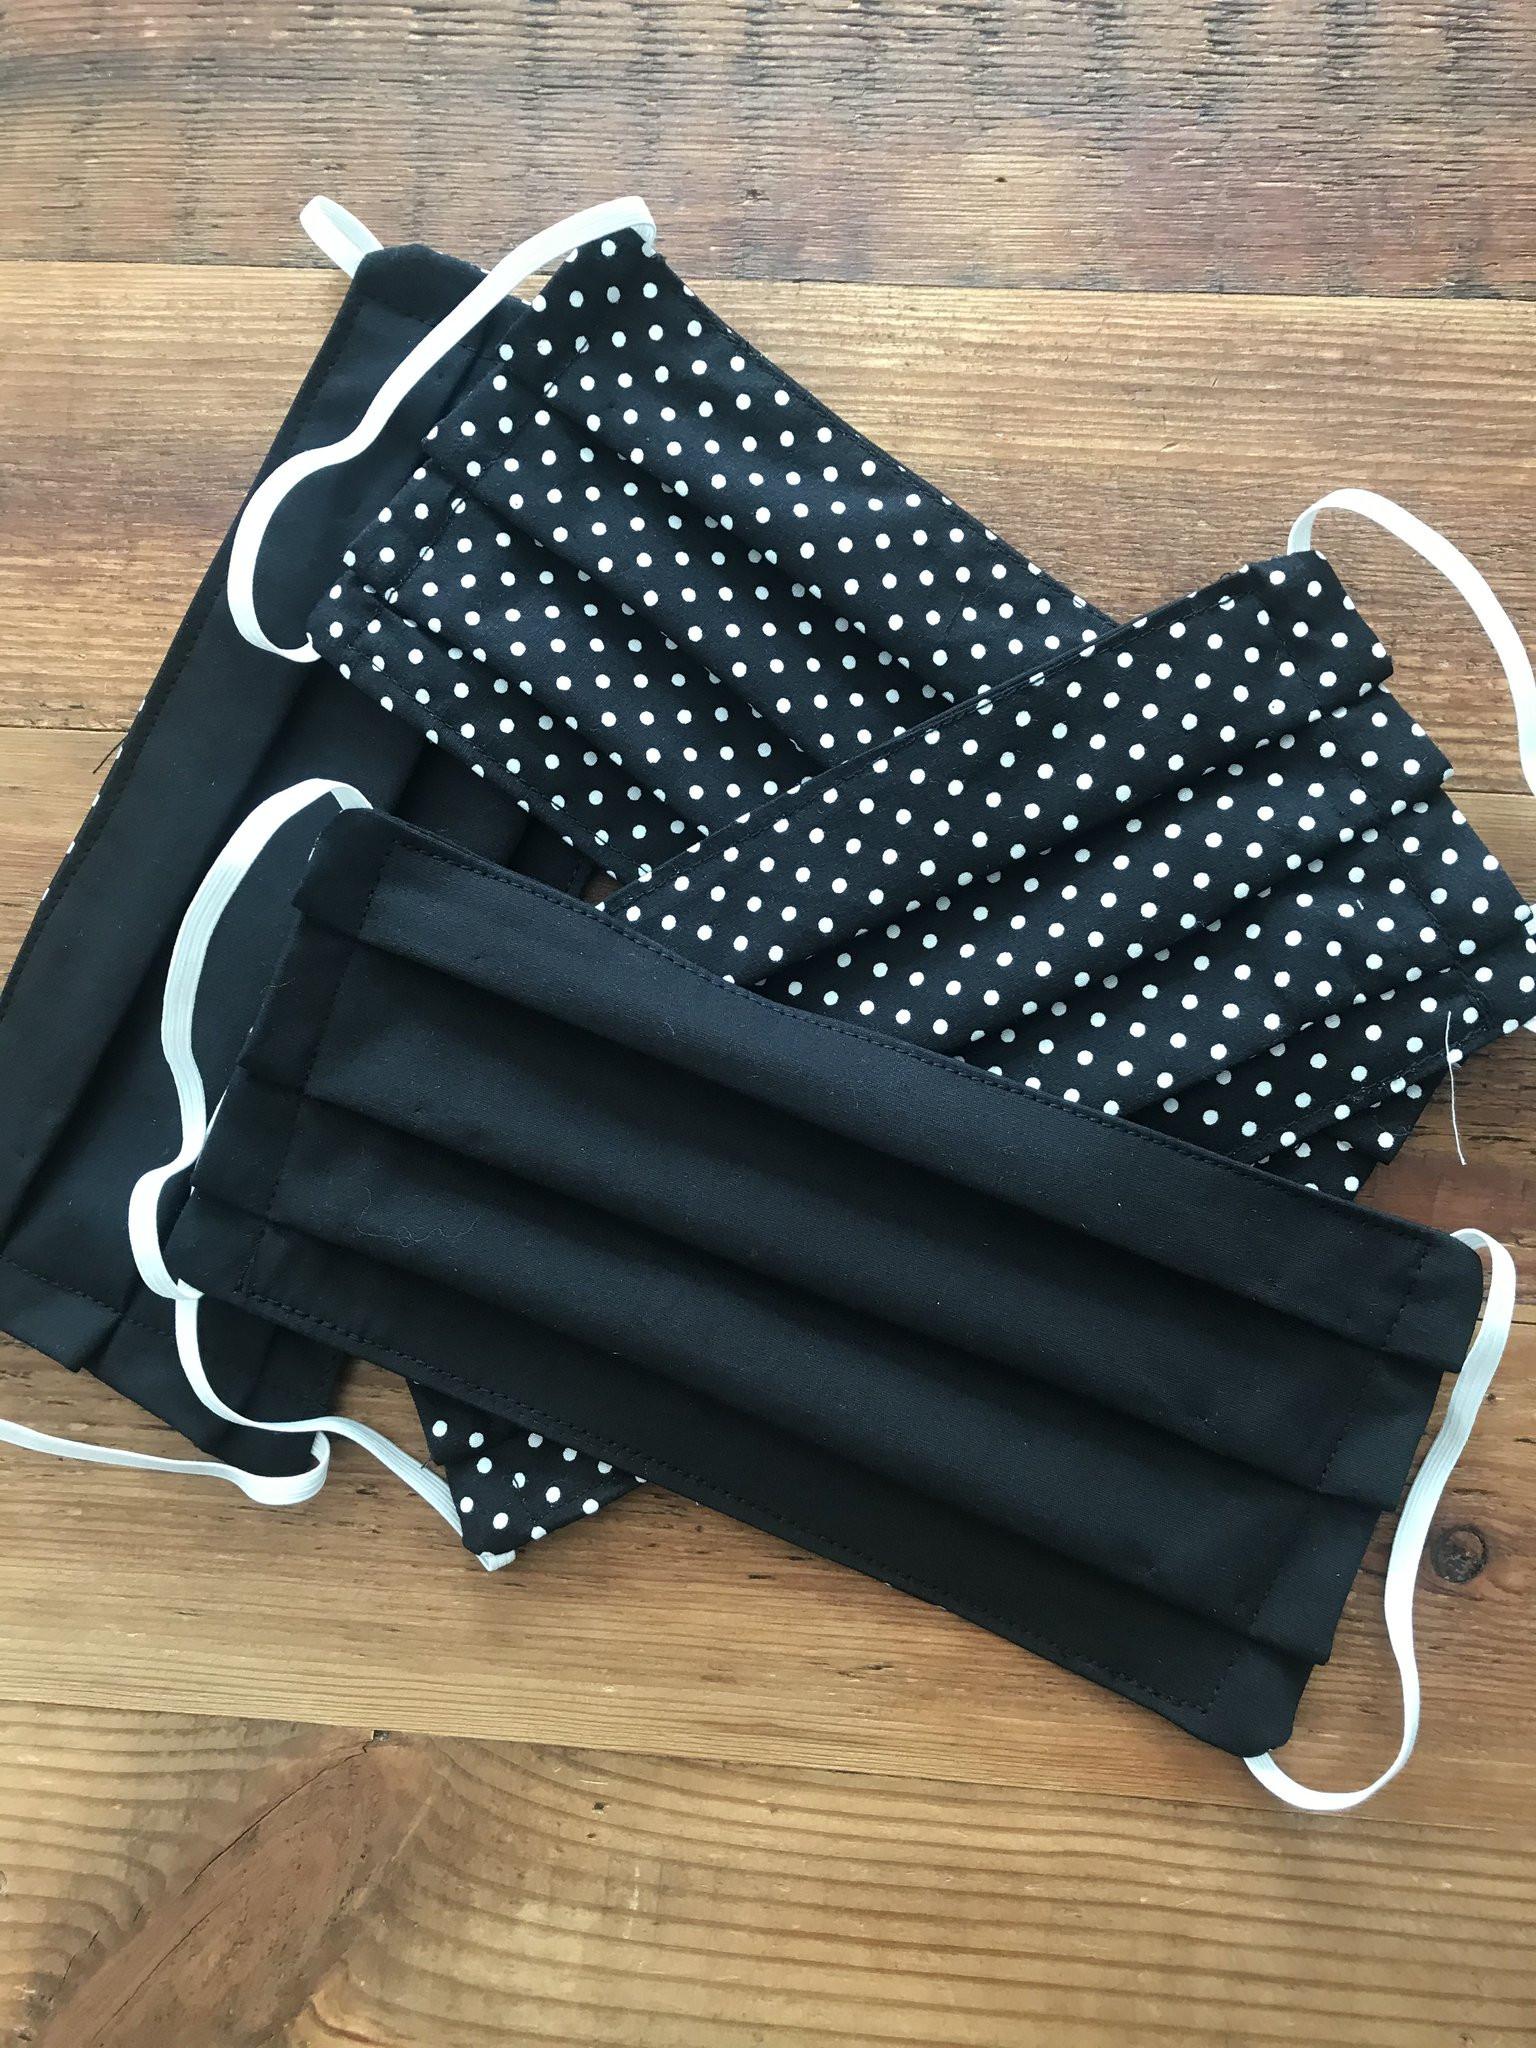 Face Mask Black and Polka dot- Reusable & Washable